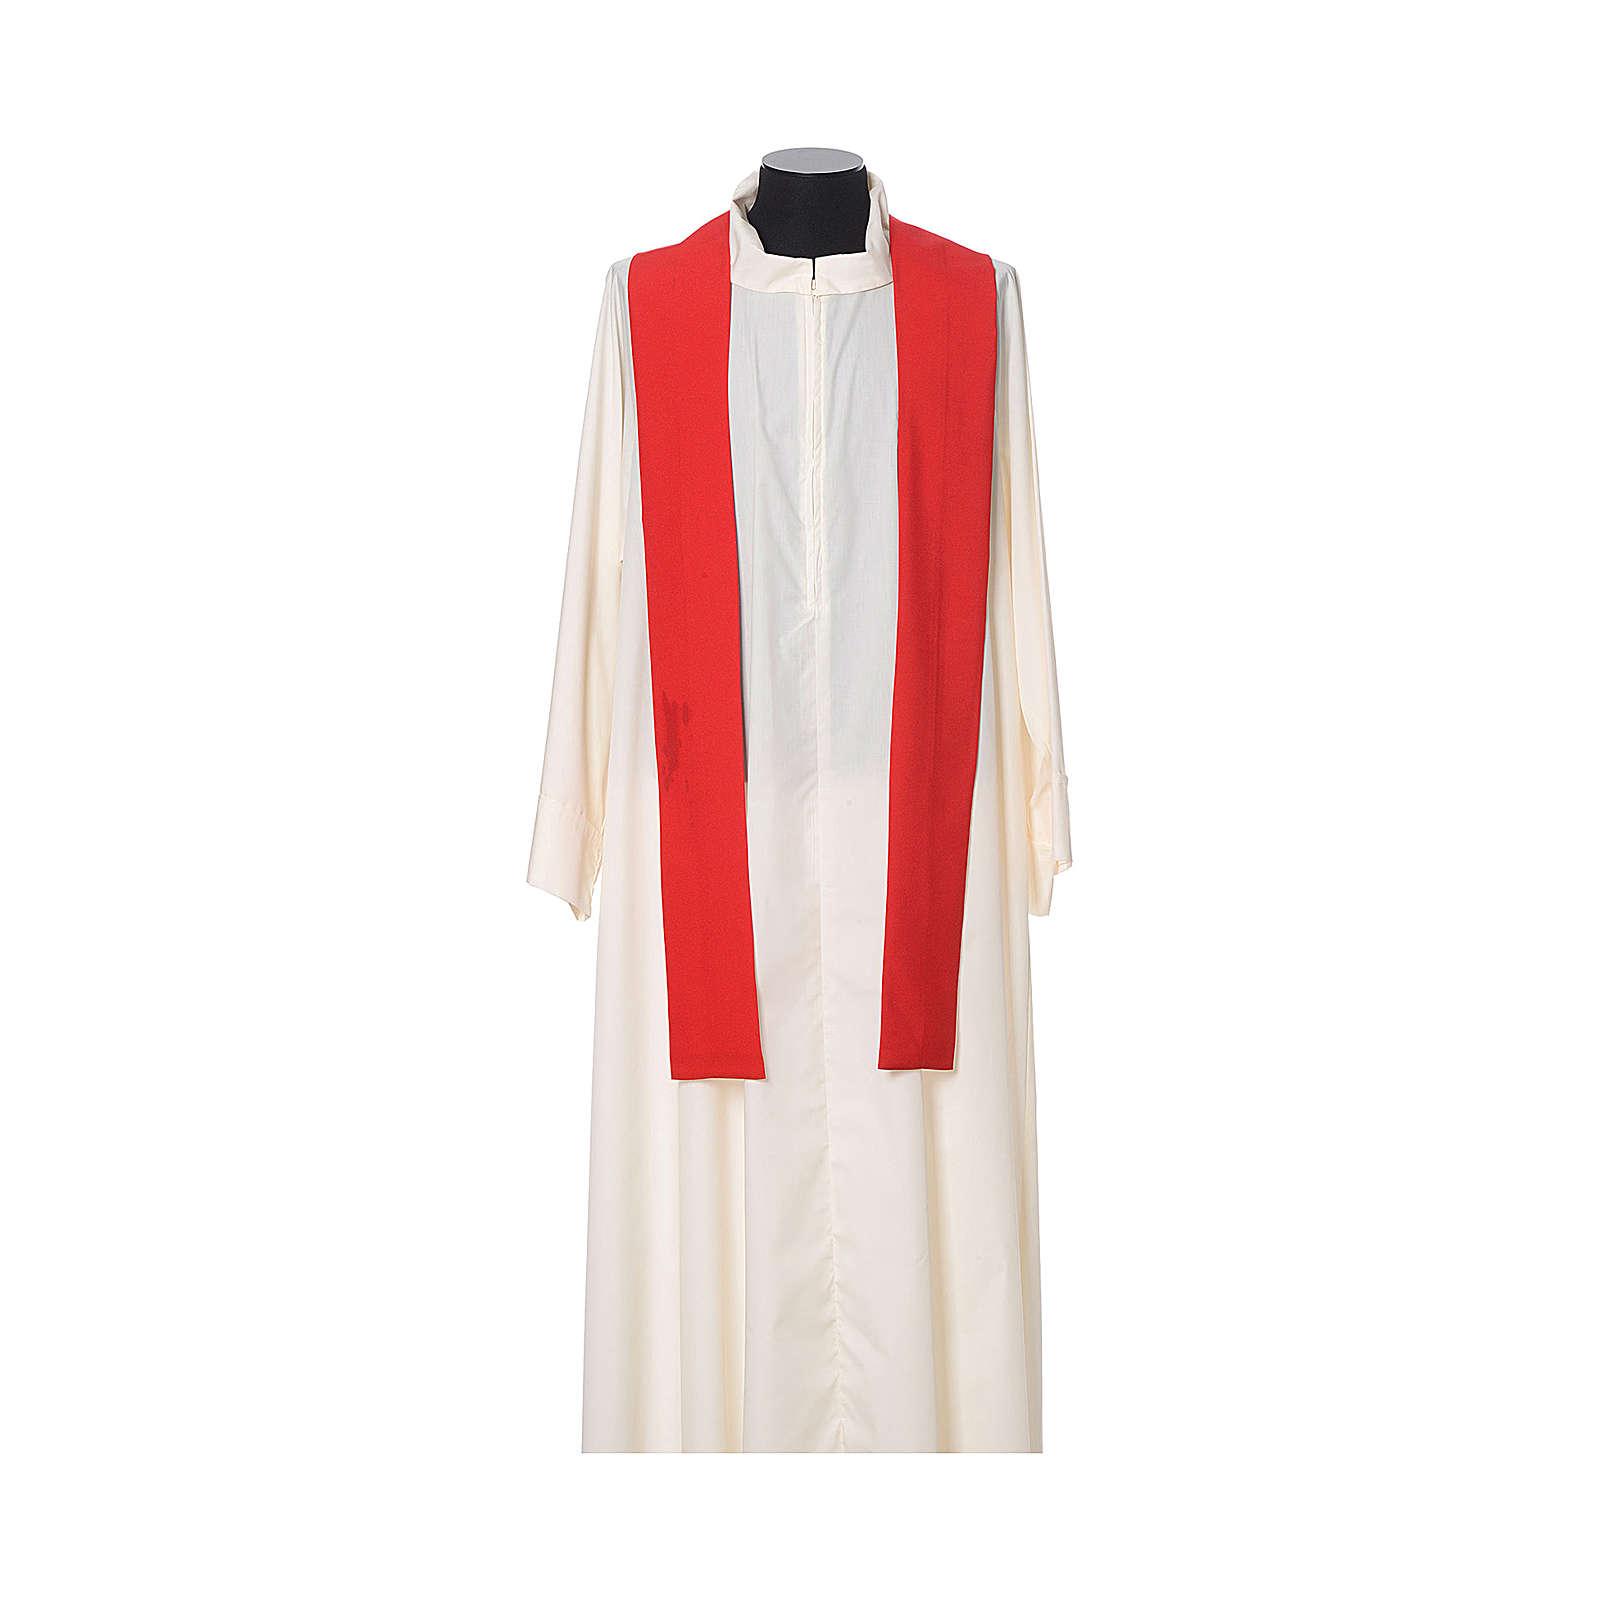 Chasuble bord croix avant tissu Vatican 100% polyester 4